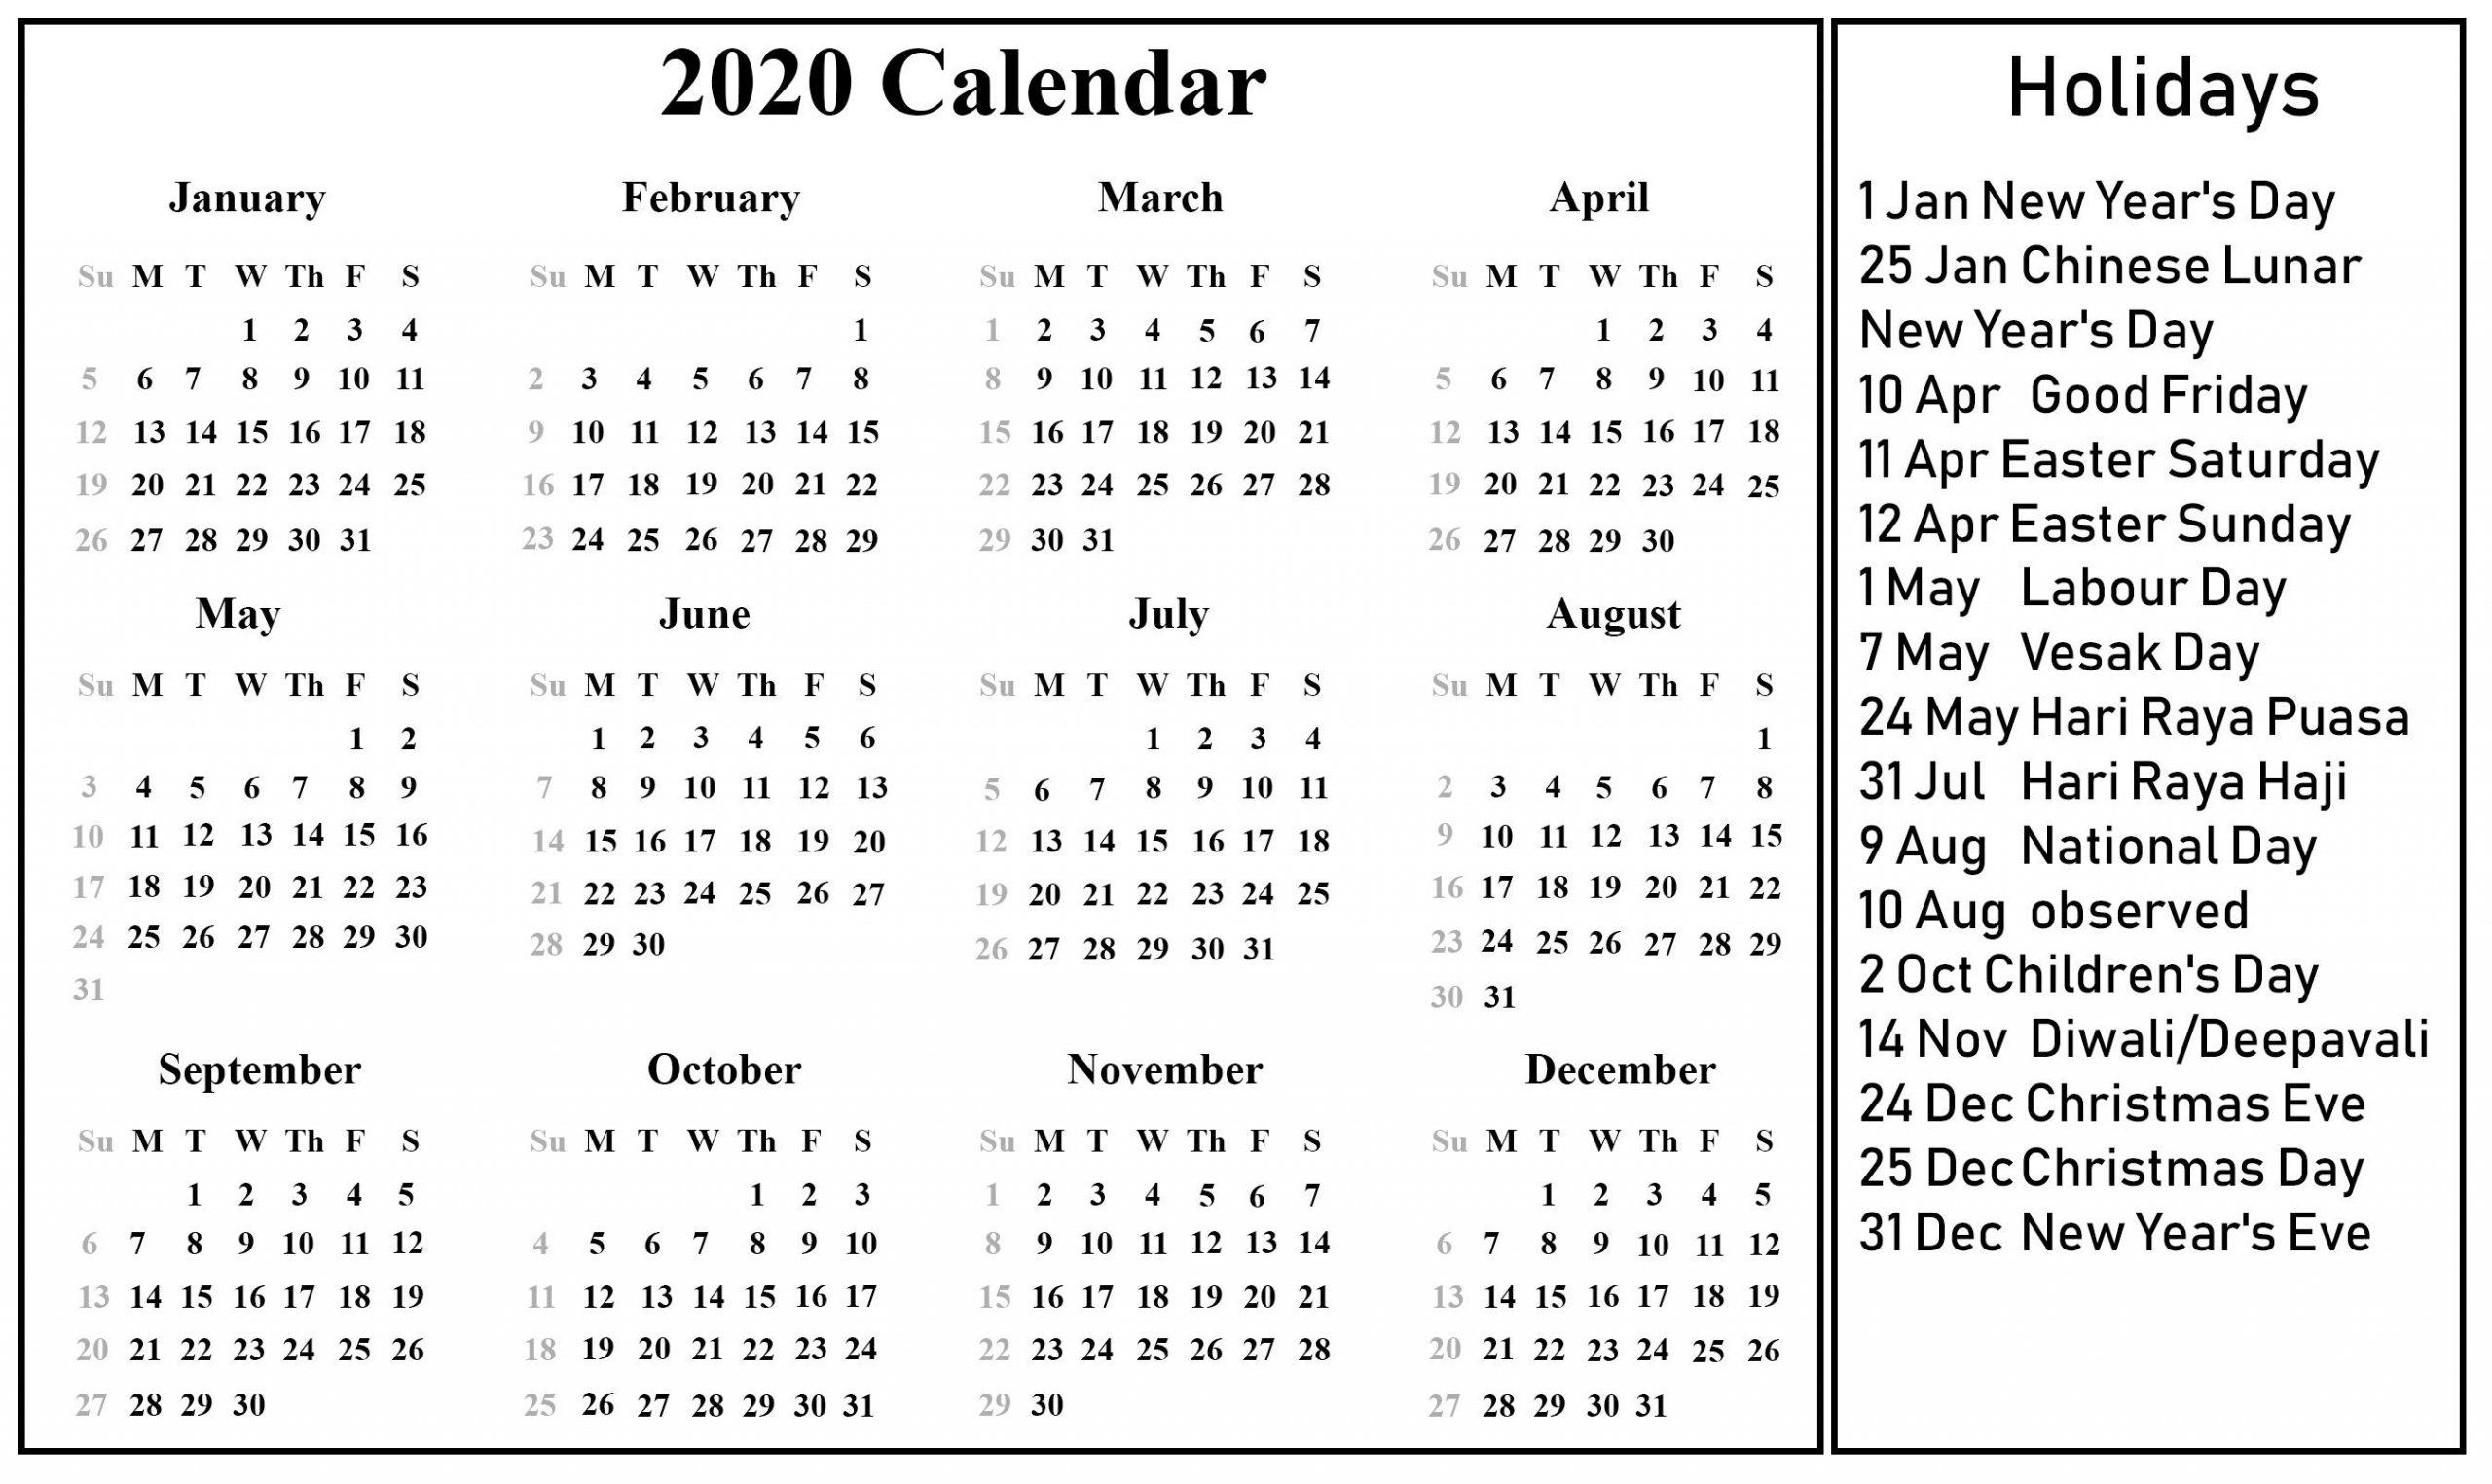 Impressive 2020 Calendar Holidays Sri Lanka In 2020  2021 Calender With Mercantile  Holidays